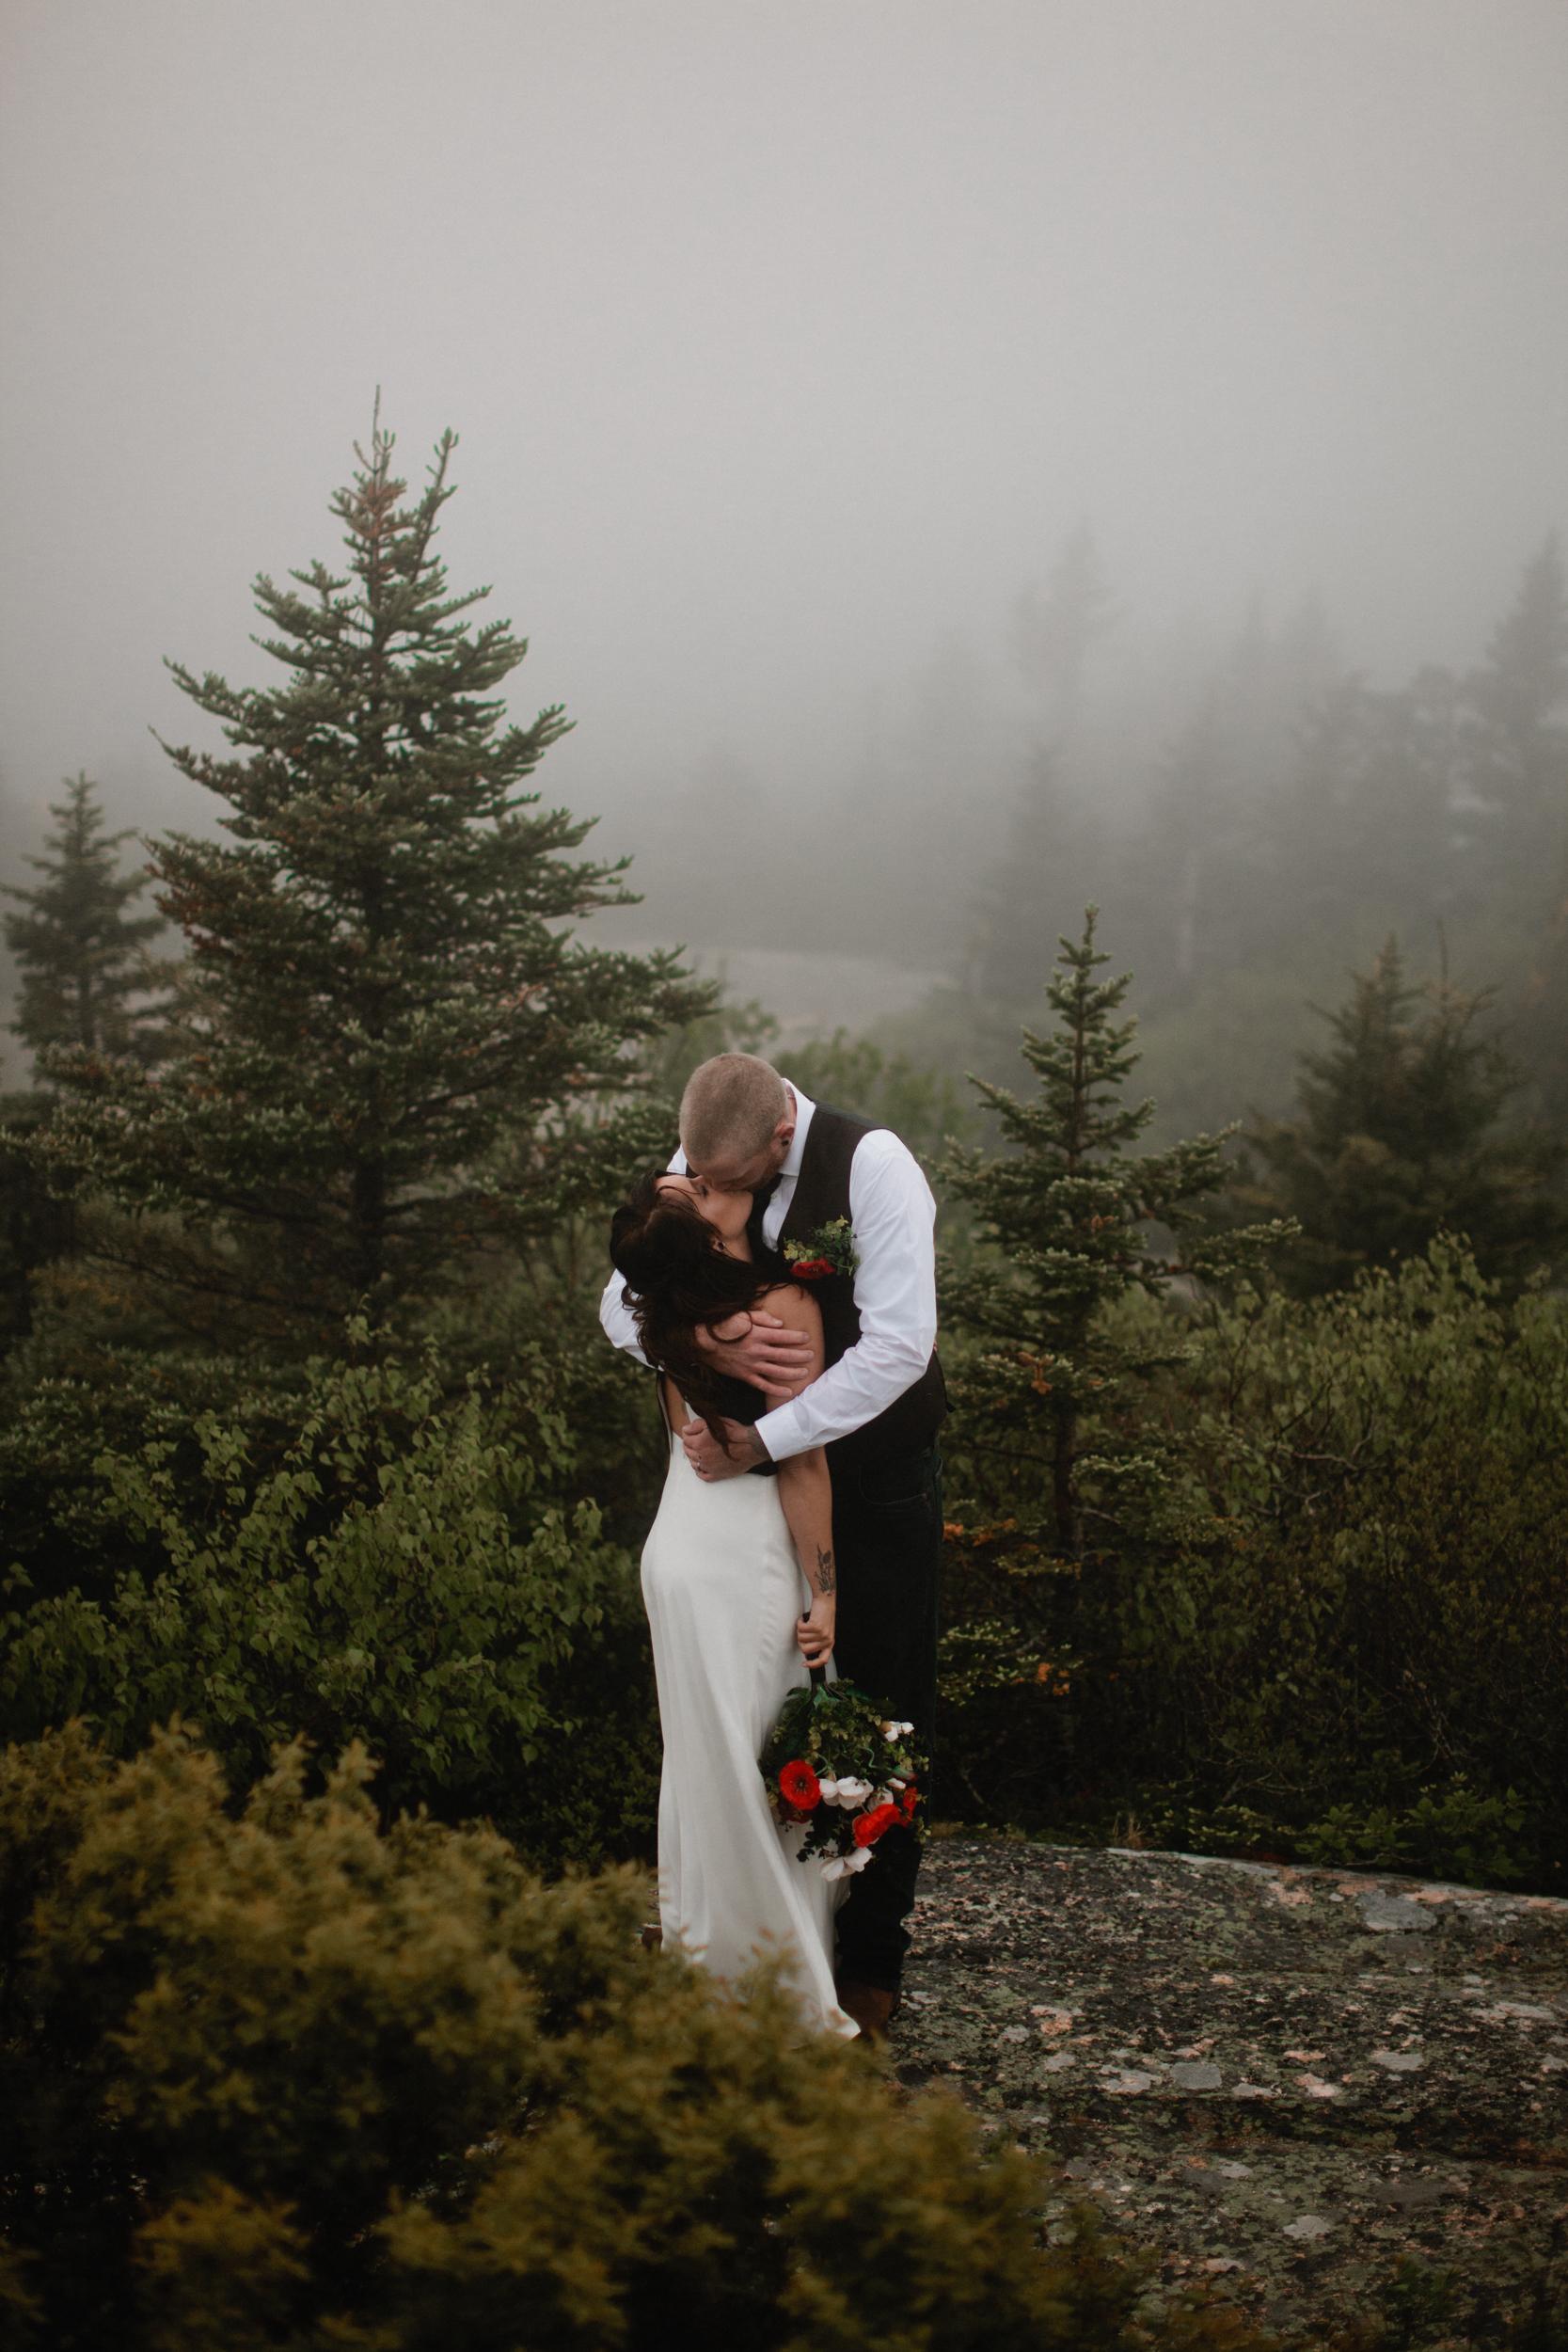 Acadia-National-Park-Elopement-47.jpg